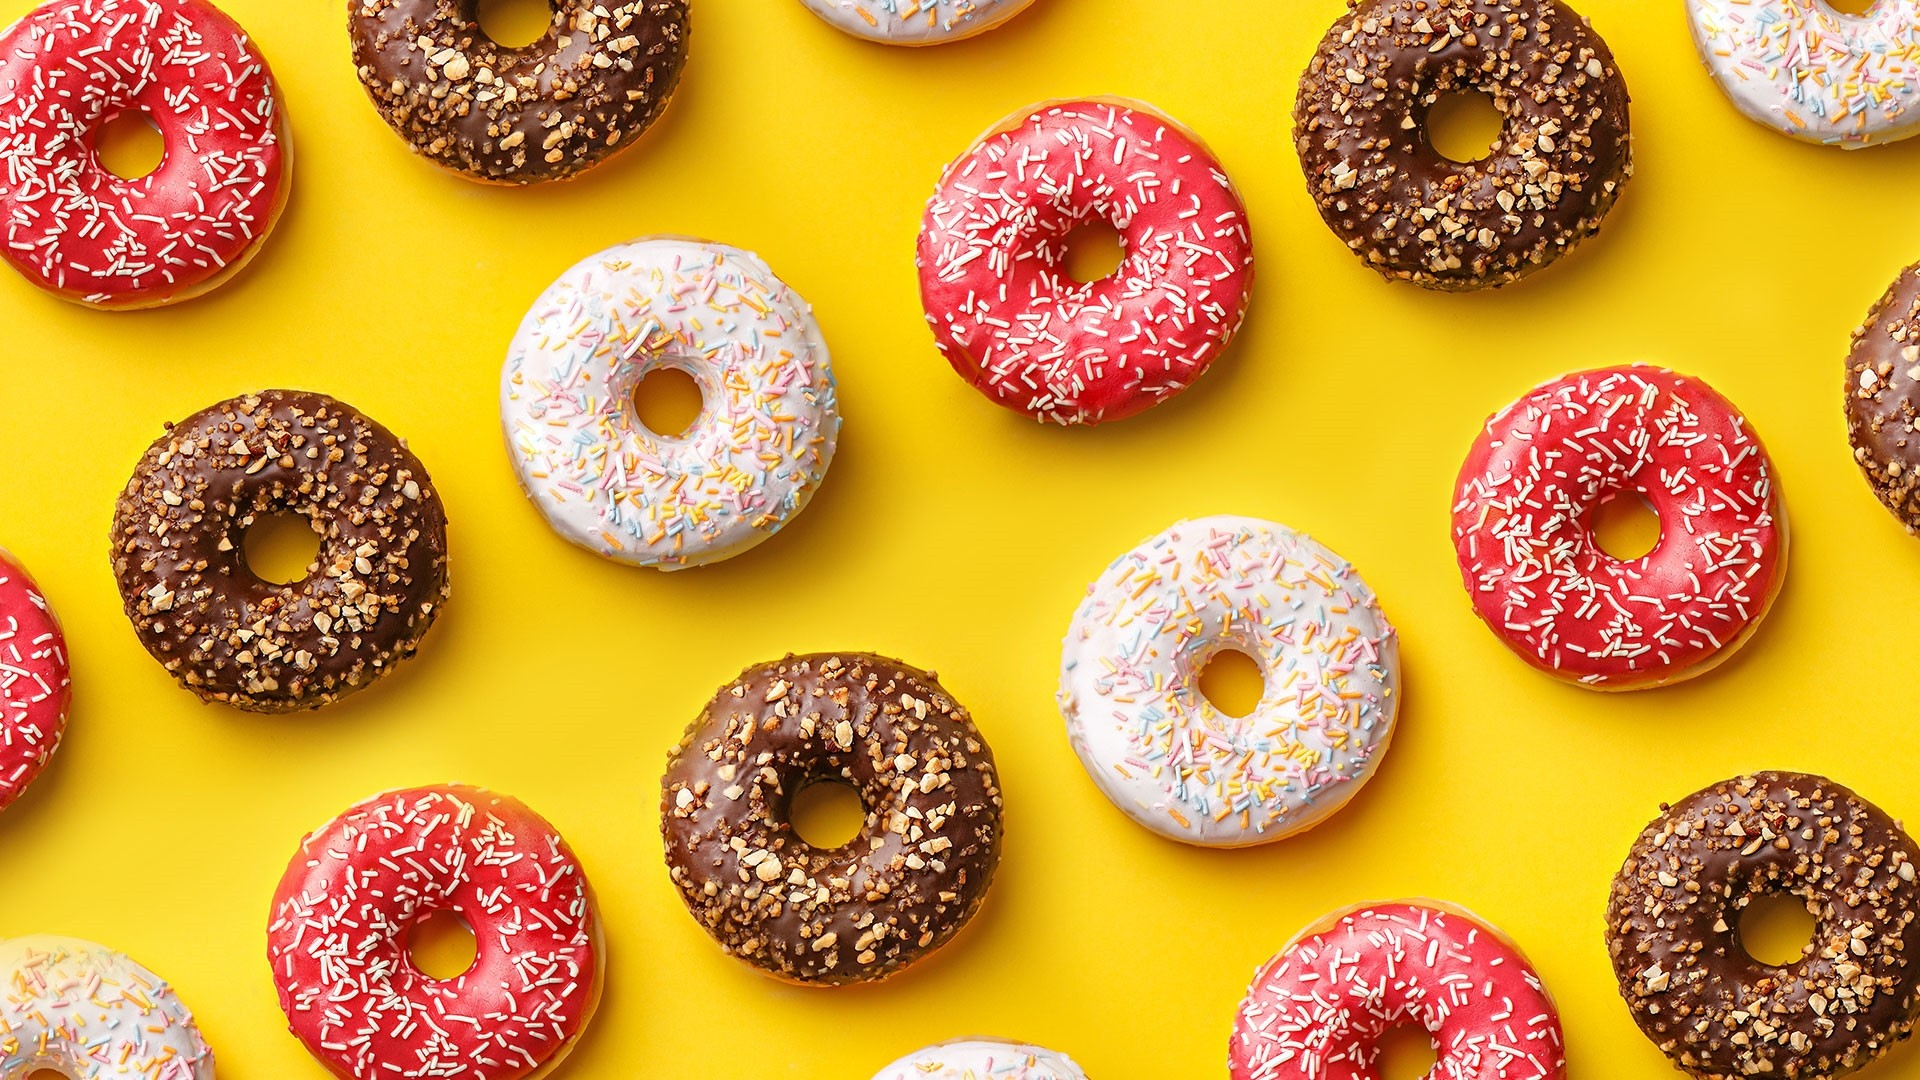 Donut Desktop wallpaper